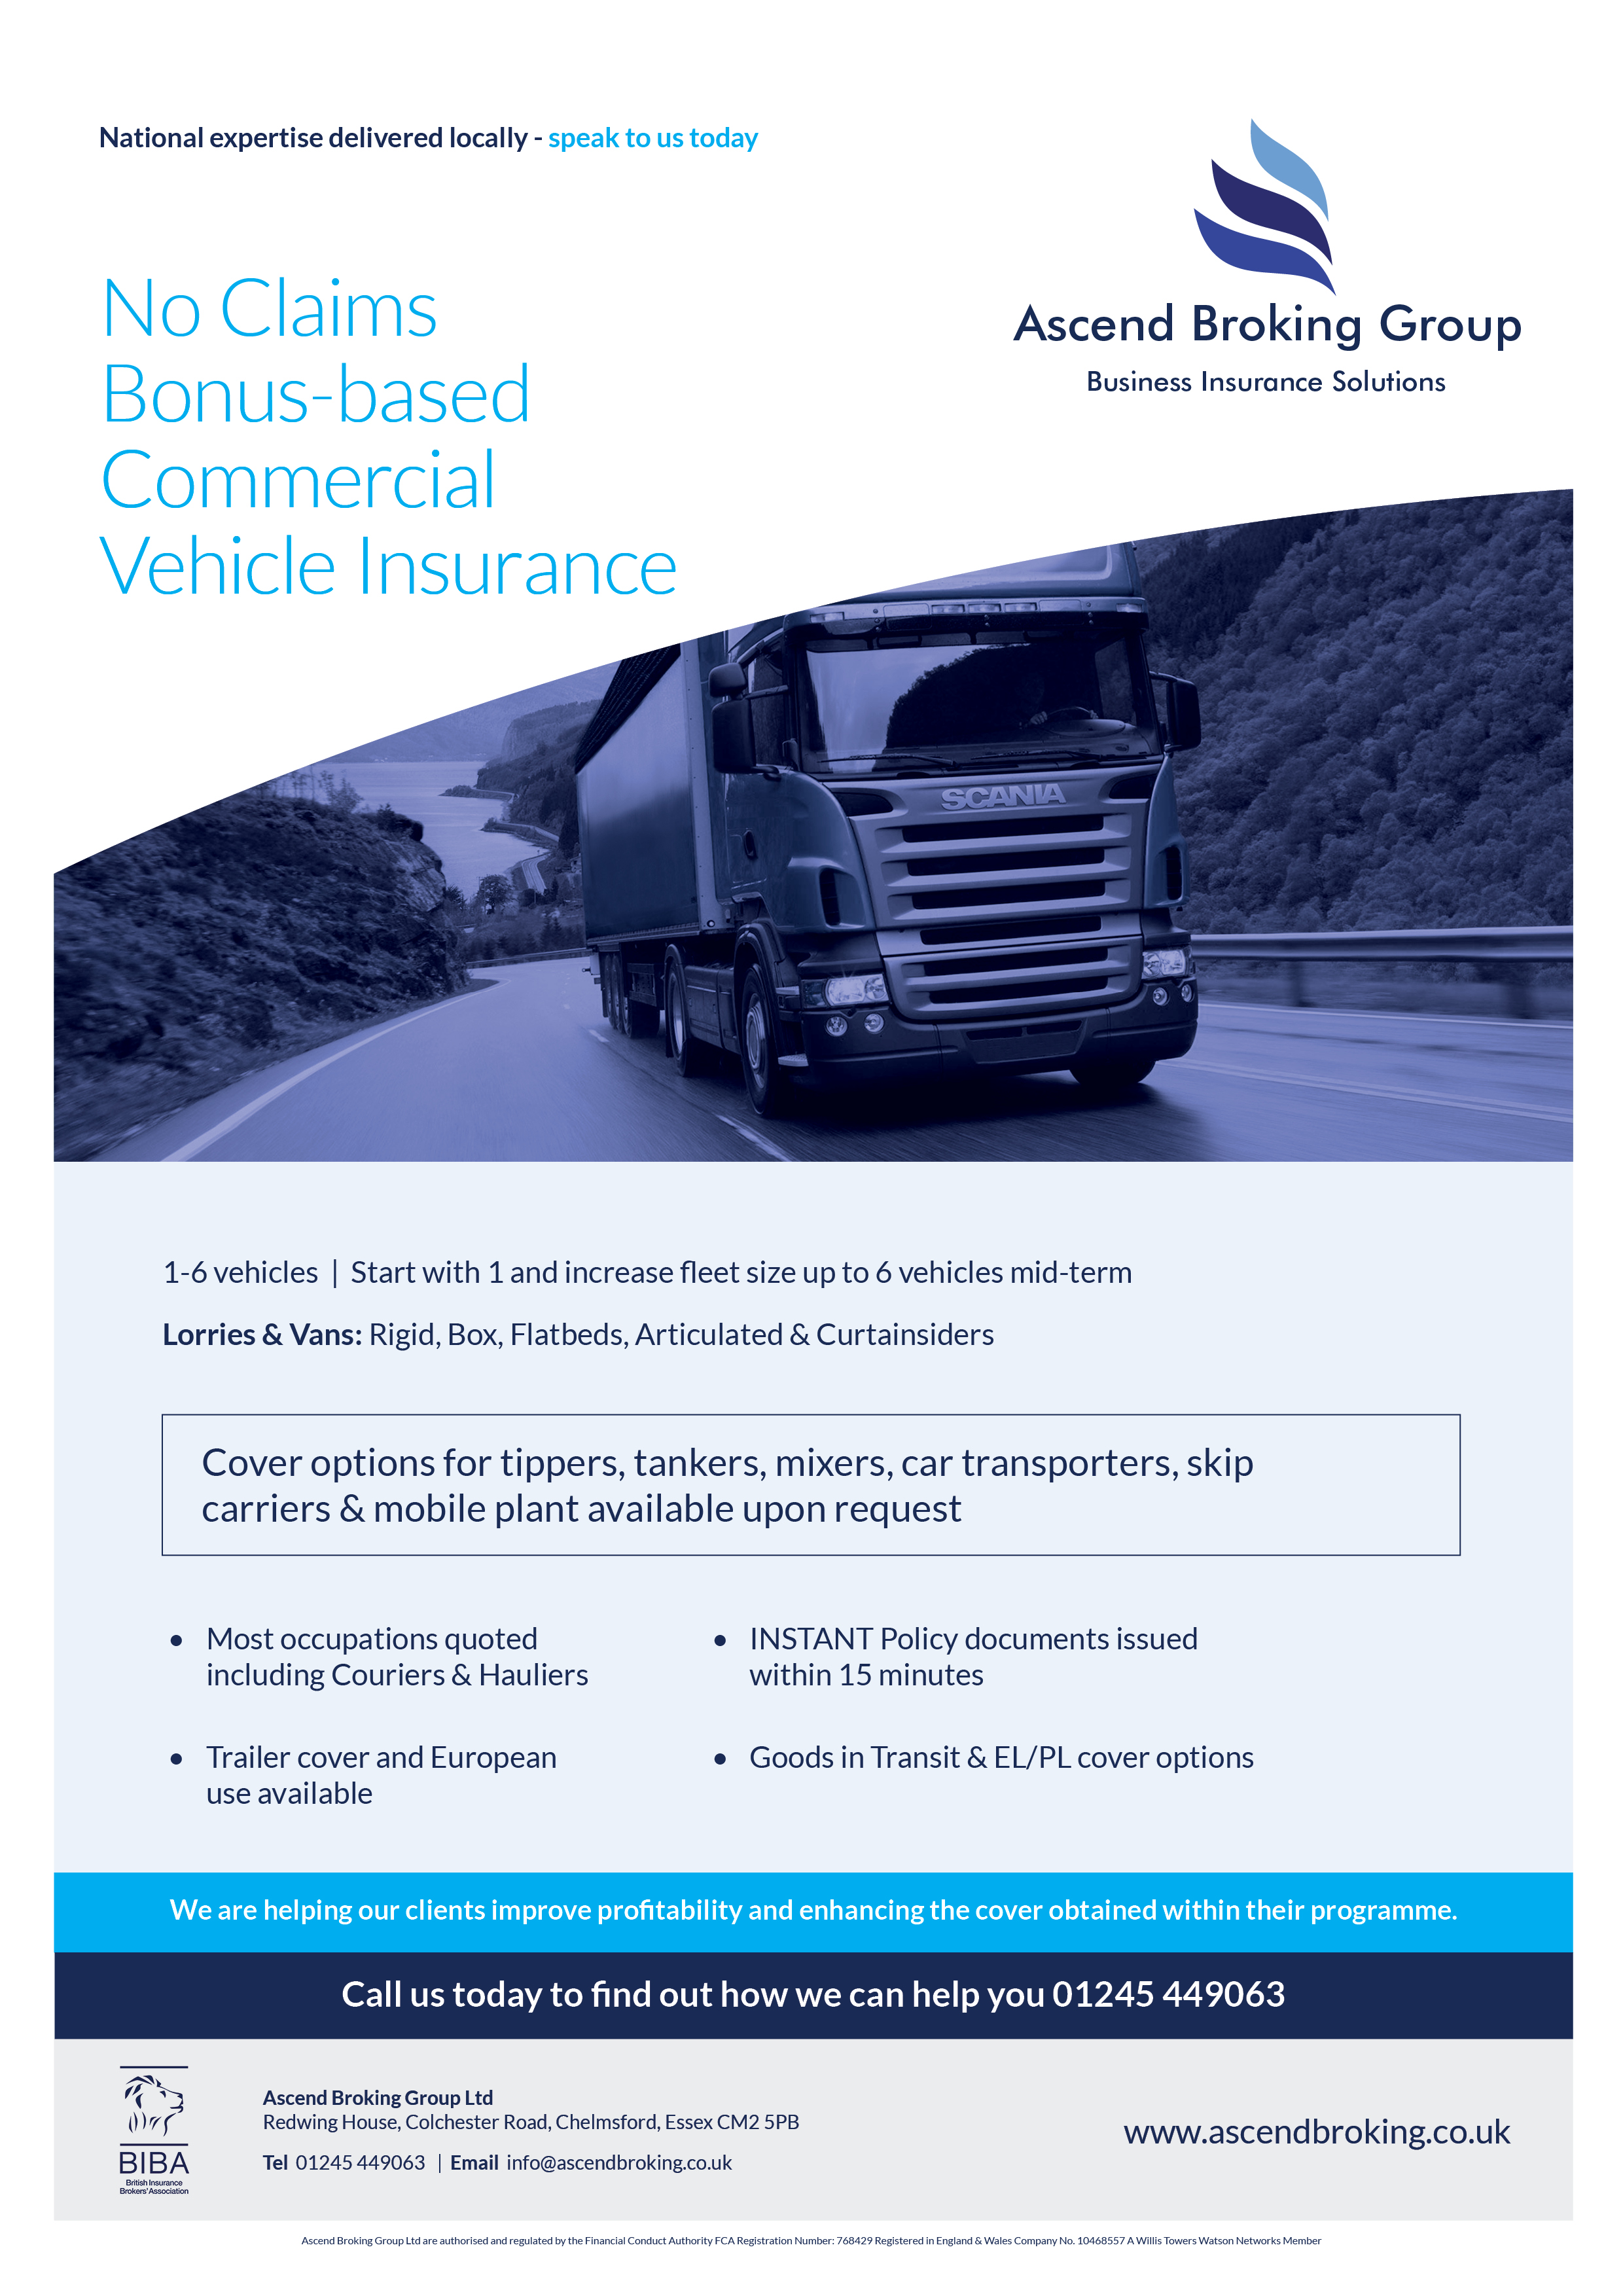 No Claims Bonus-based Commercial Vehicle Insurance